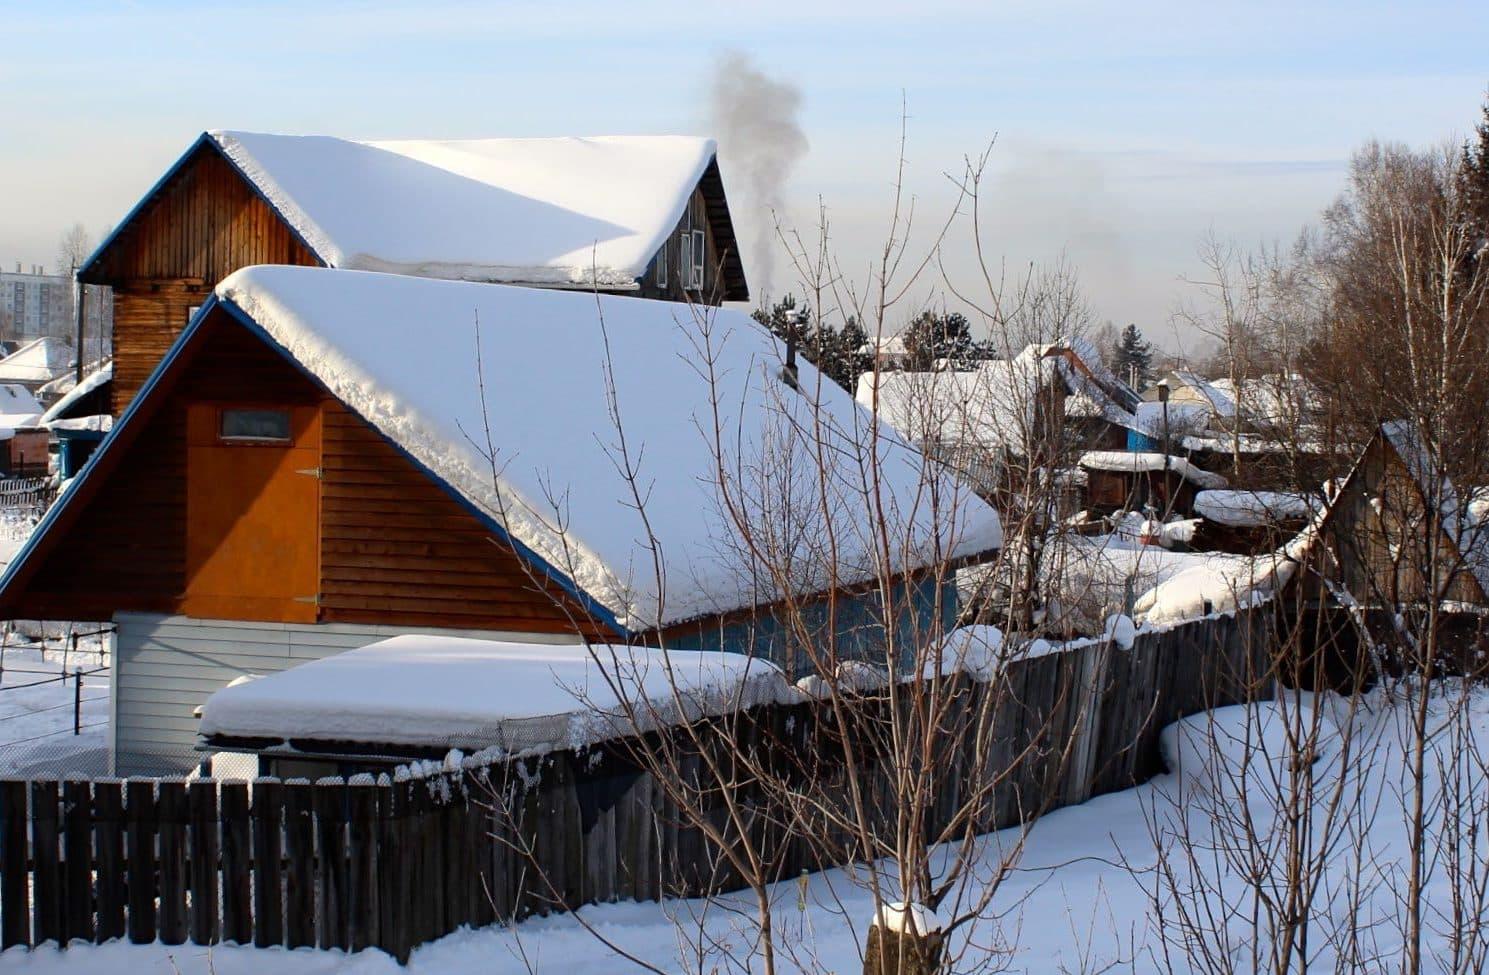 trans-siberian village in winter